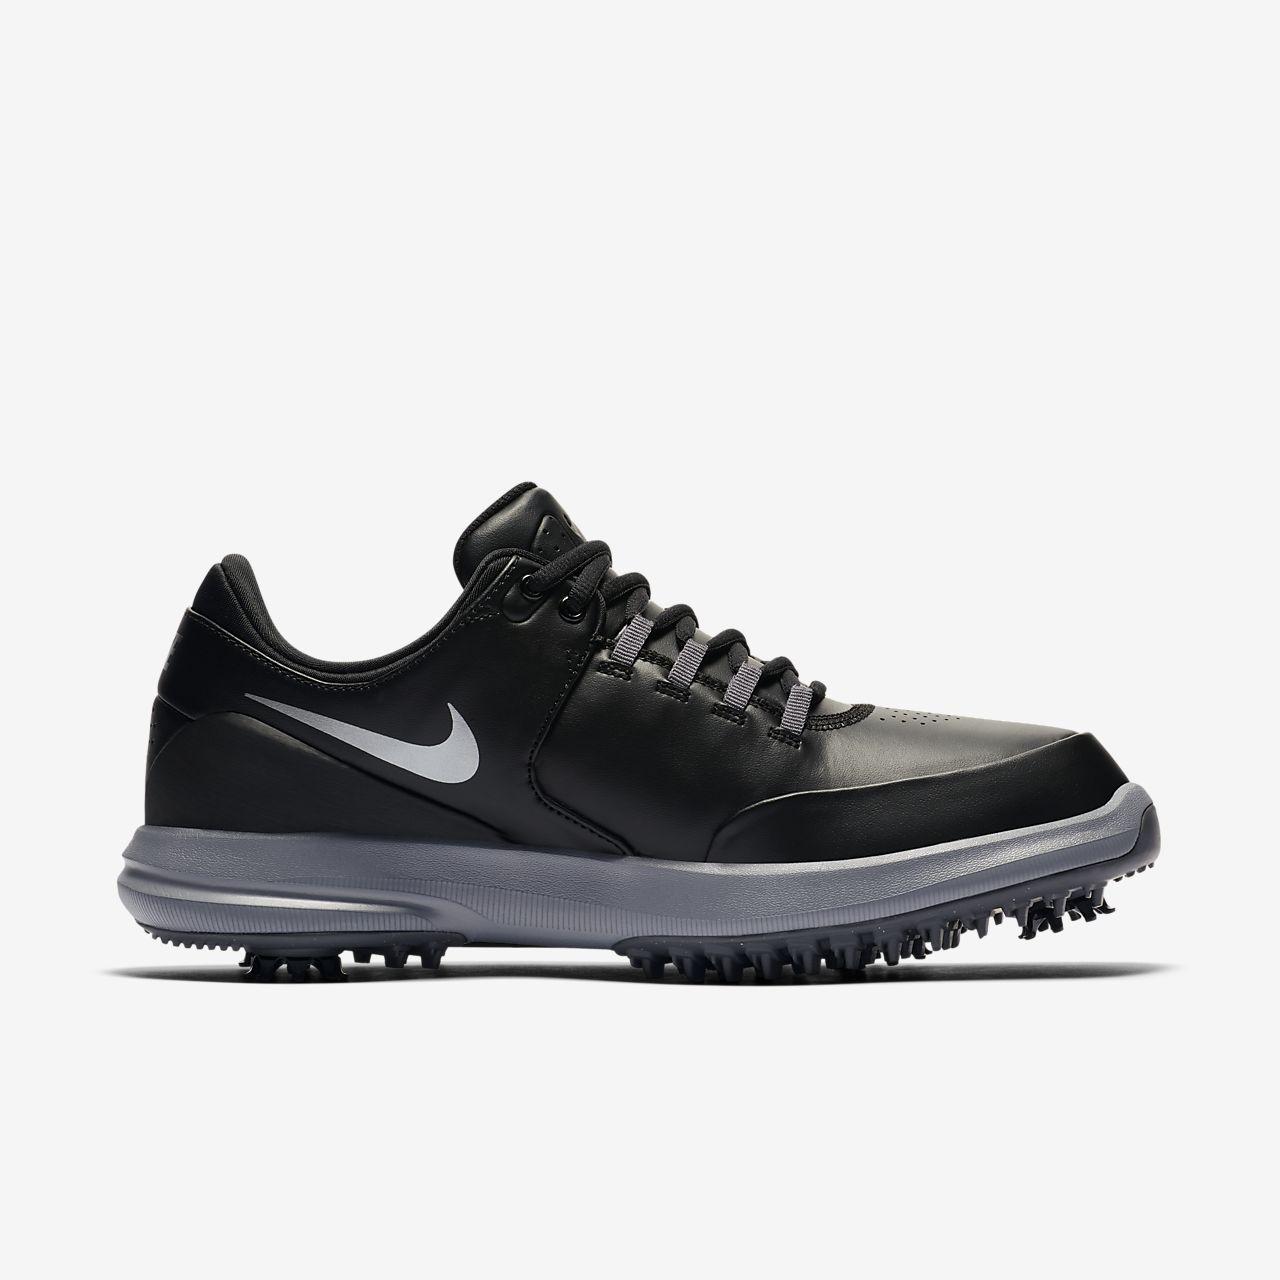 big sale a8751 b9ce4 ... Nike Air Zoom Accurate Mens Golf Shoe